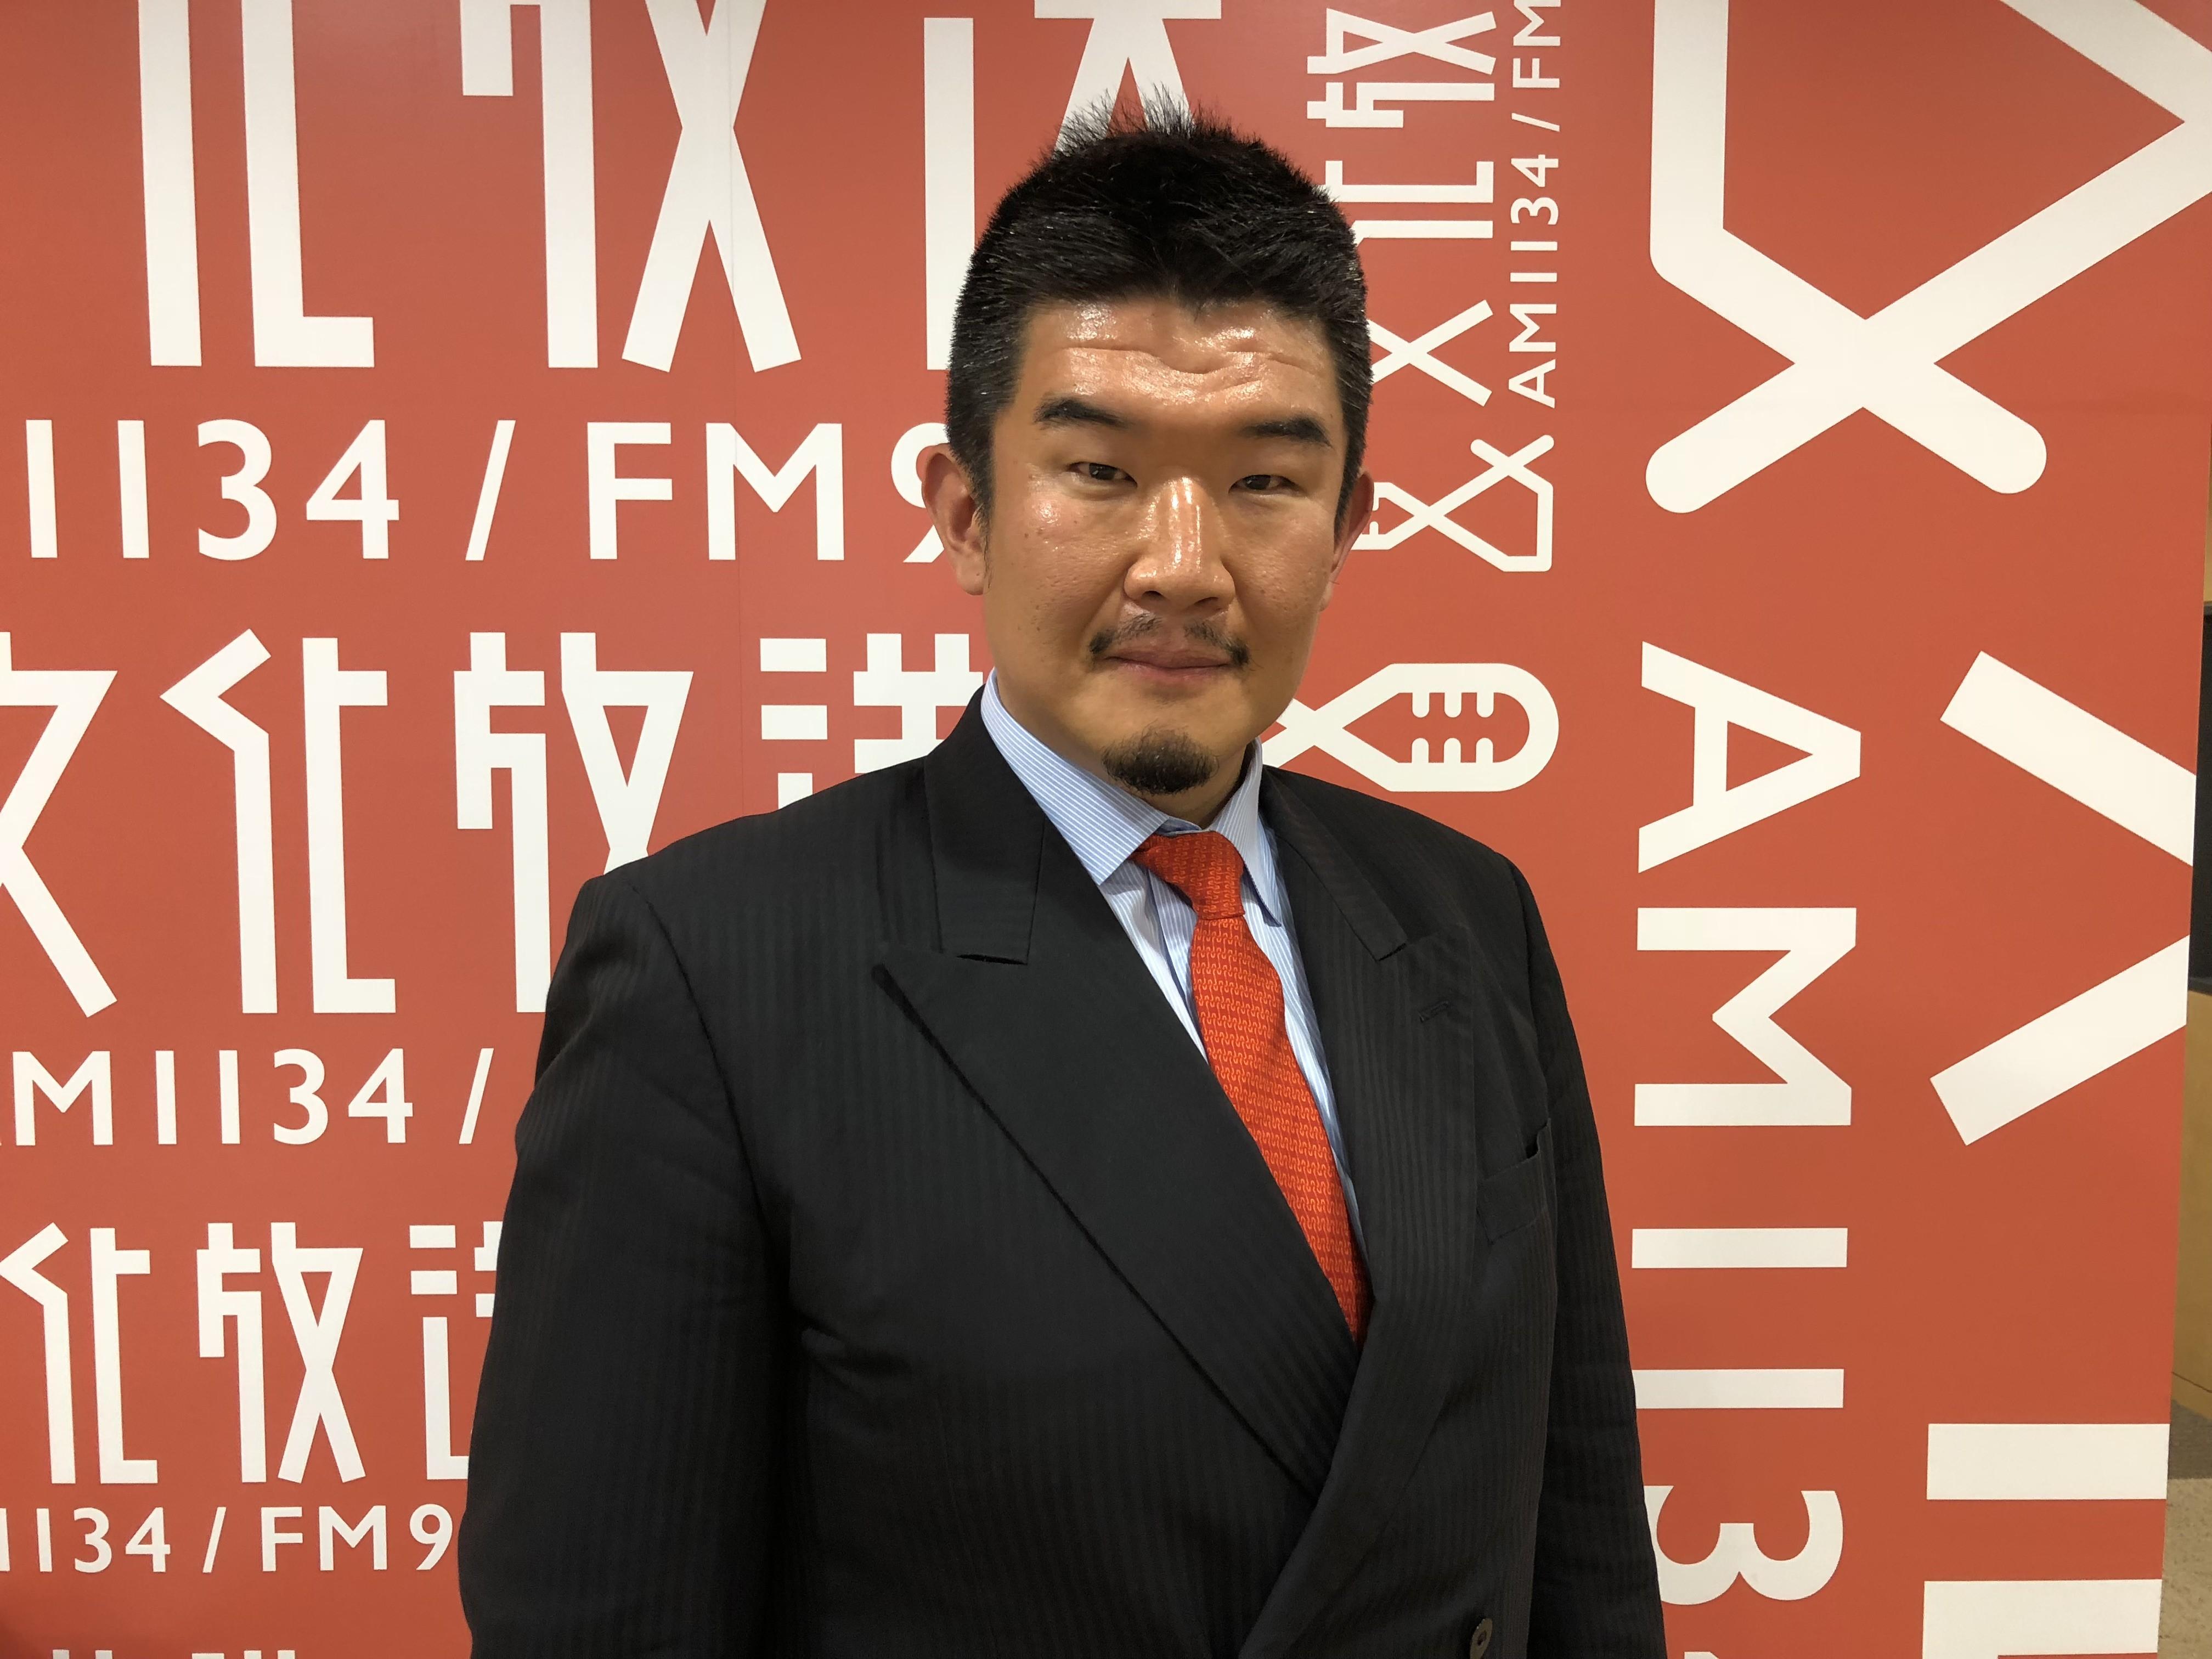 IMG_7118takishima2.JPG